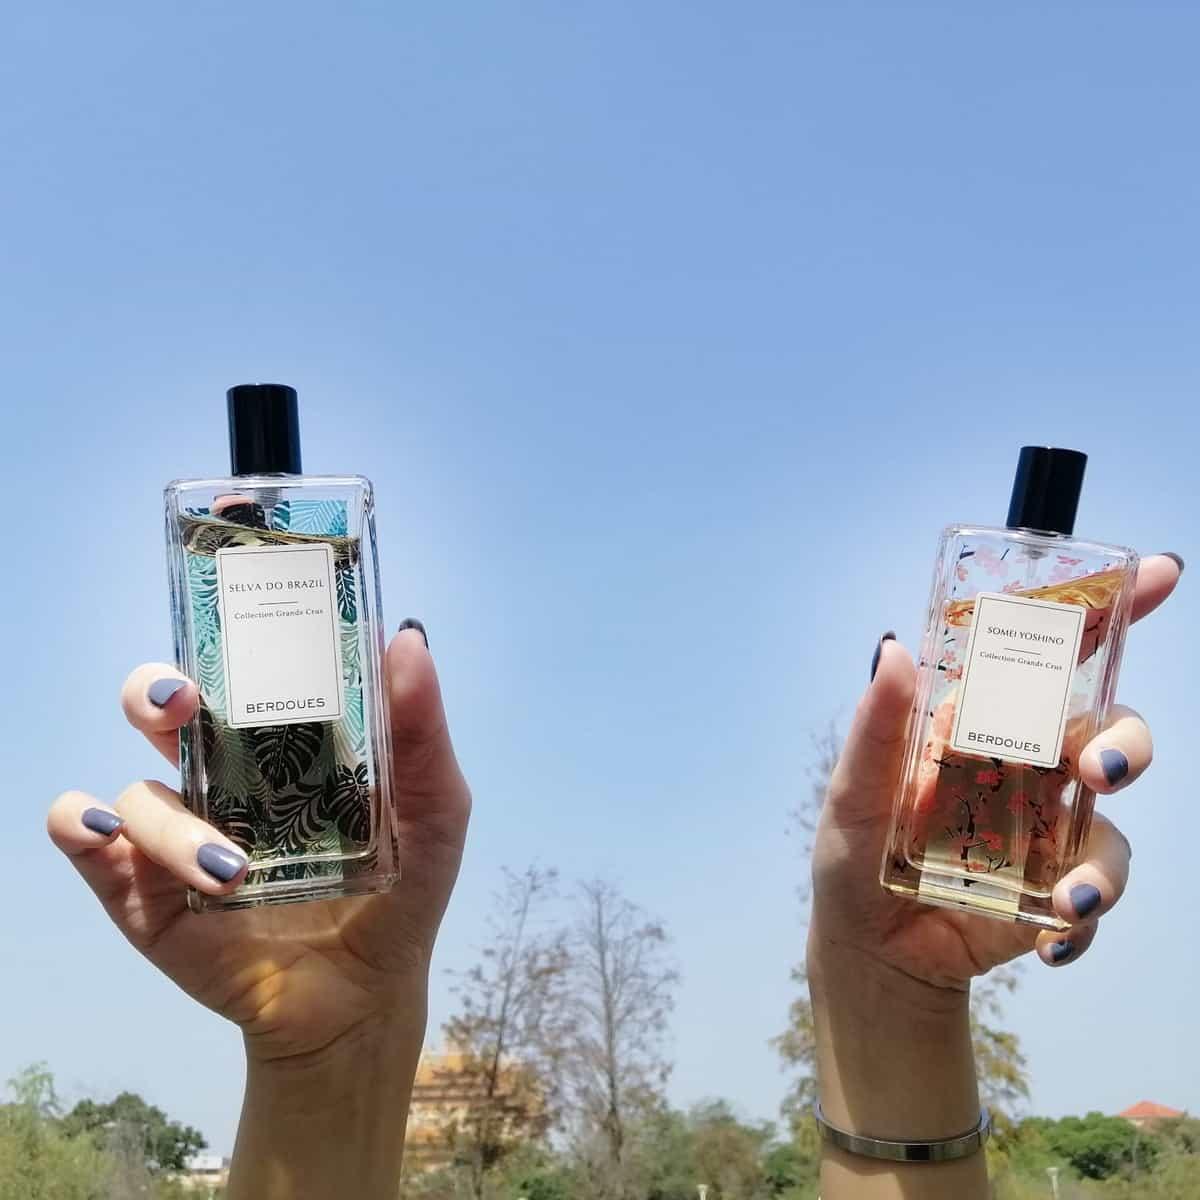 Grands crus 調配出記憶中專屬香氛, 香氛控經典蒐藏